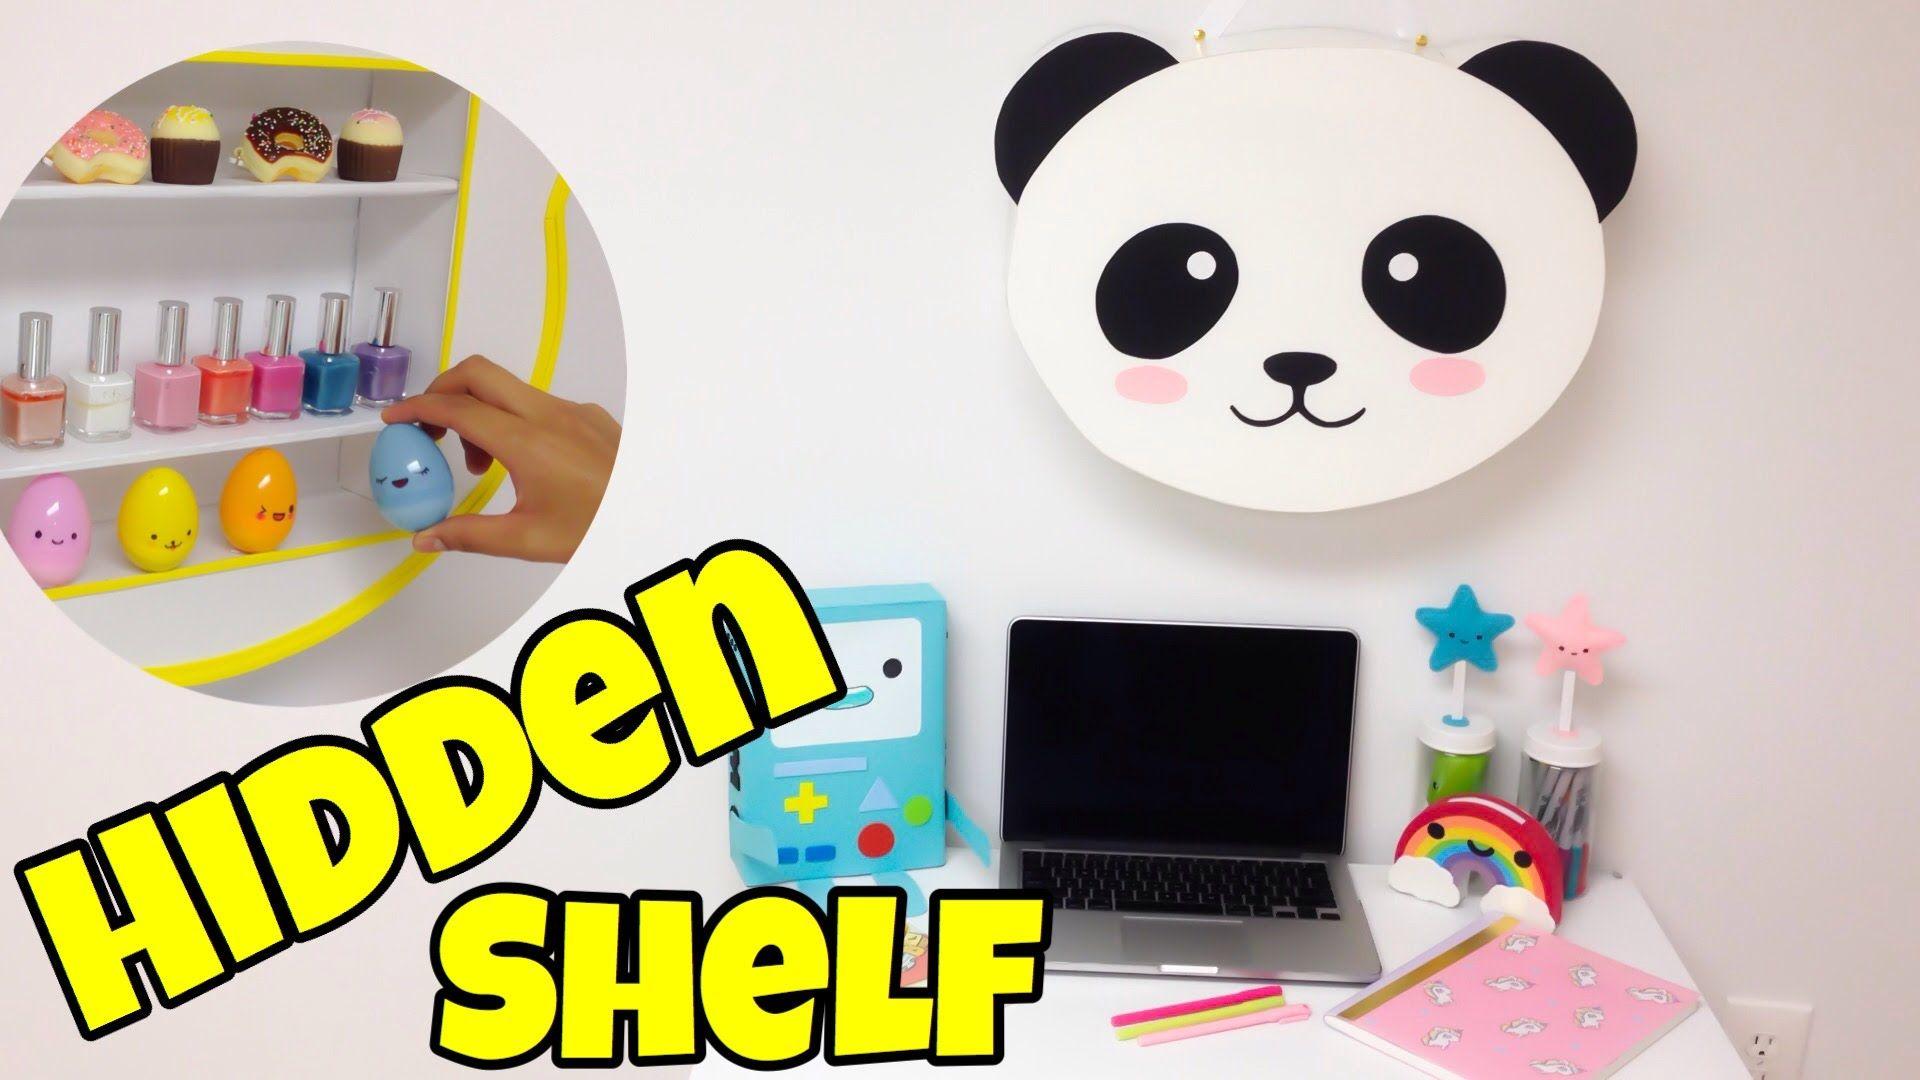 Hidden Shelf Kawaii Crafts Easy Diy Room Decor Ideas Easy Diy Room Decor Diy Room Decor Kawaii Crafts